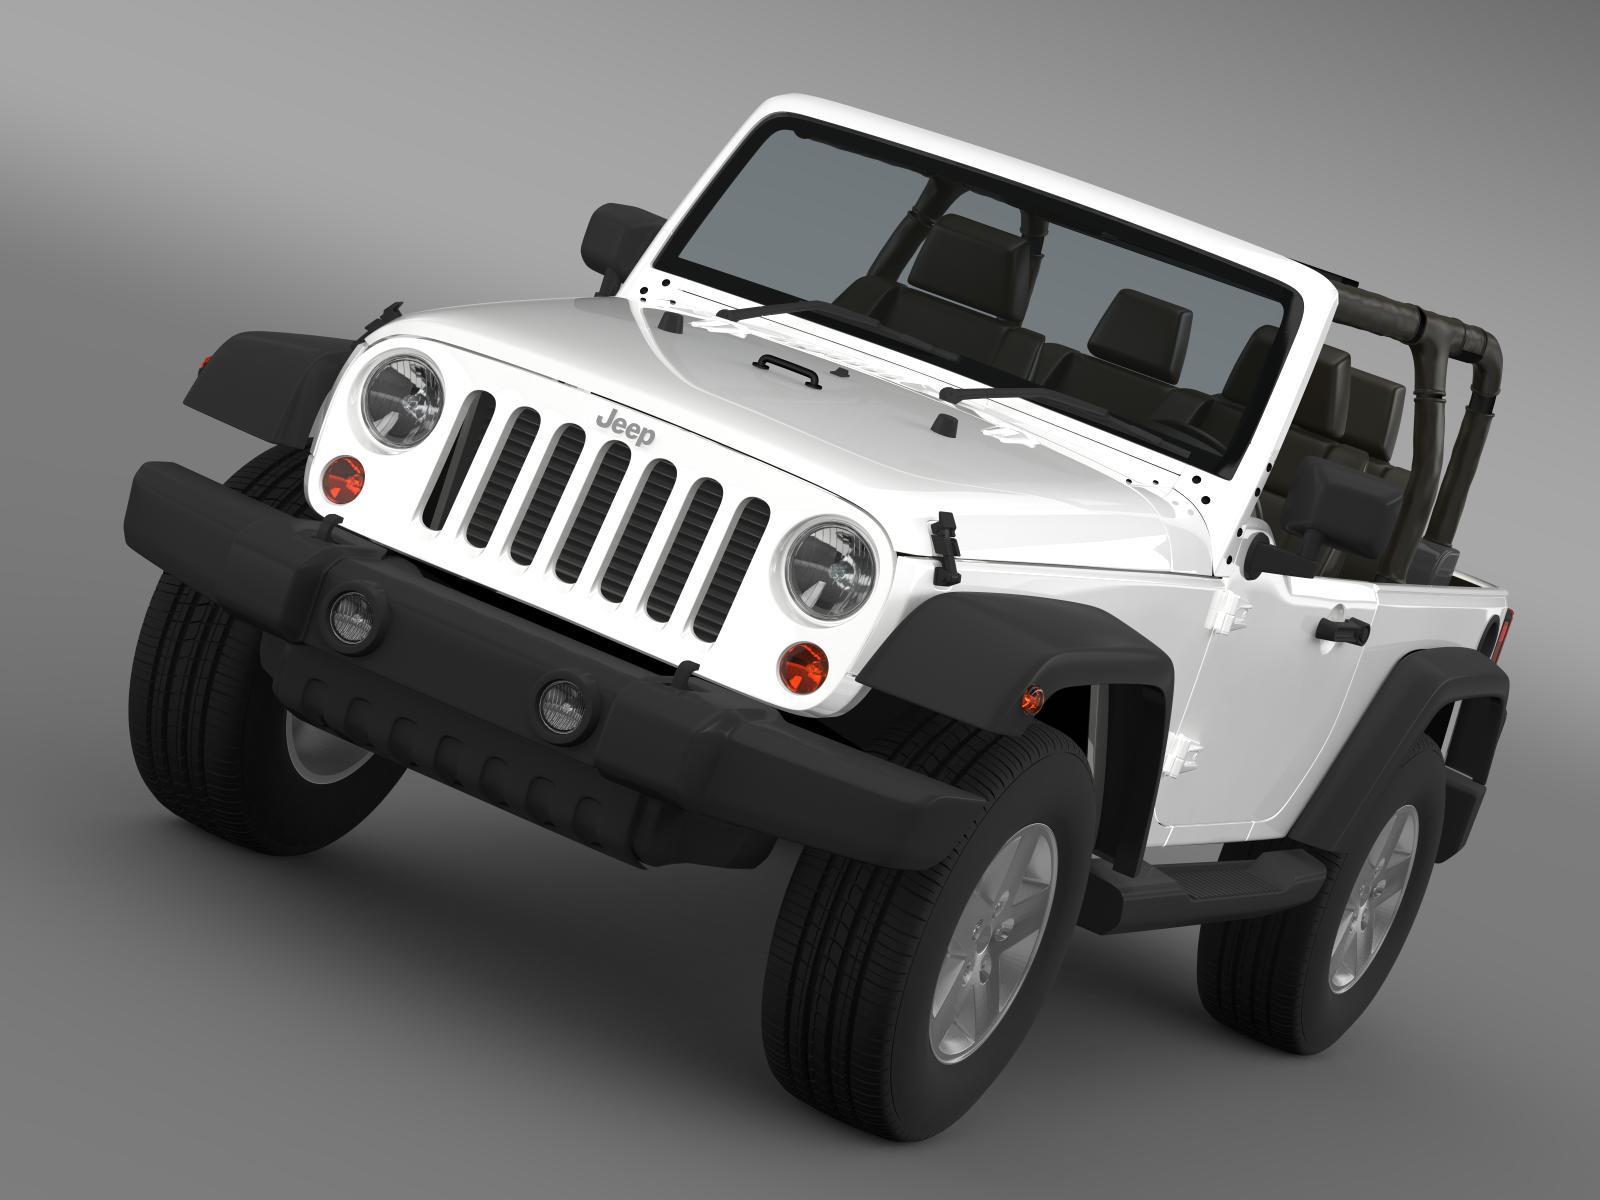 jeep wrangler islander edition 2010 3d model 3ds max fbx c4d lwo ma mb hrc xsi obj 162479